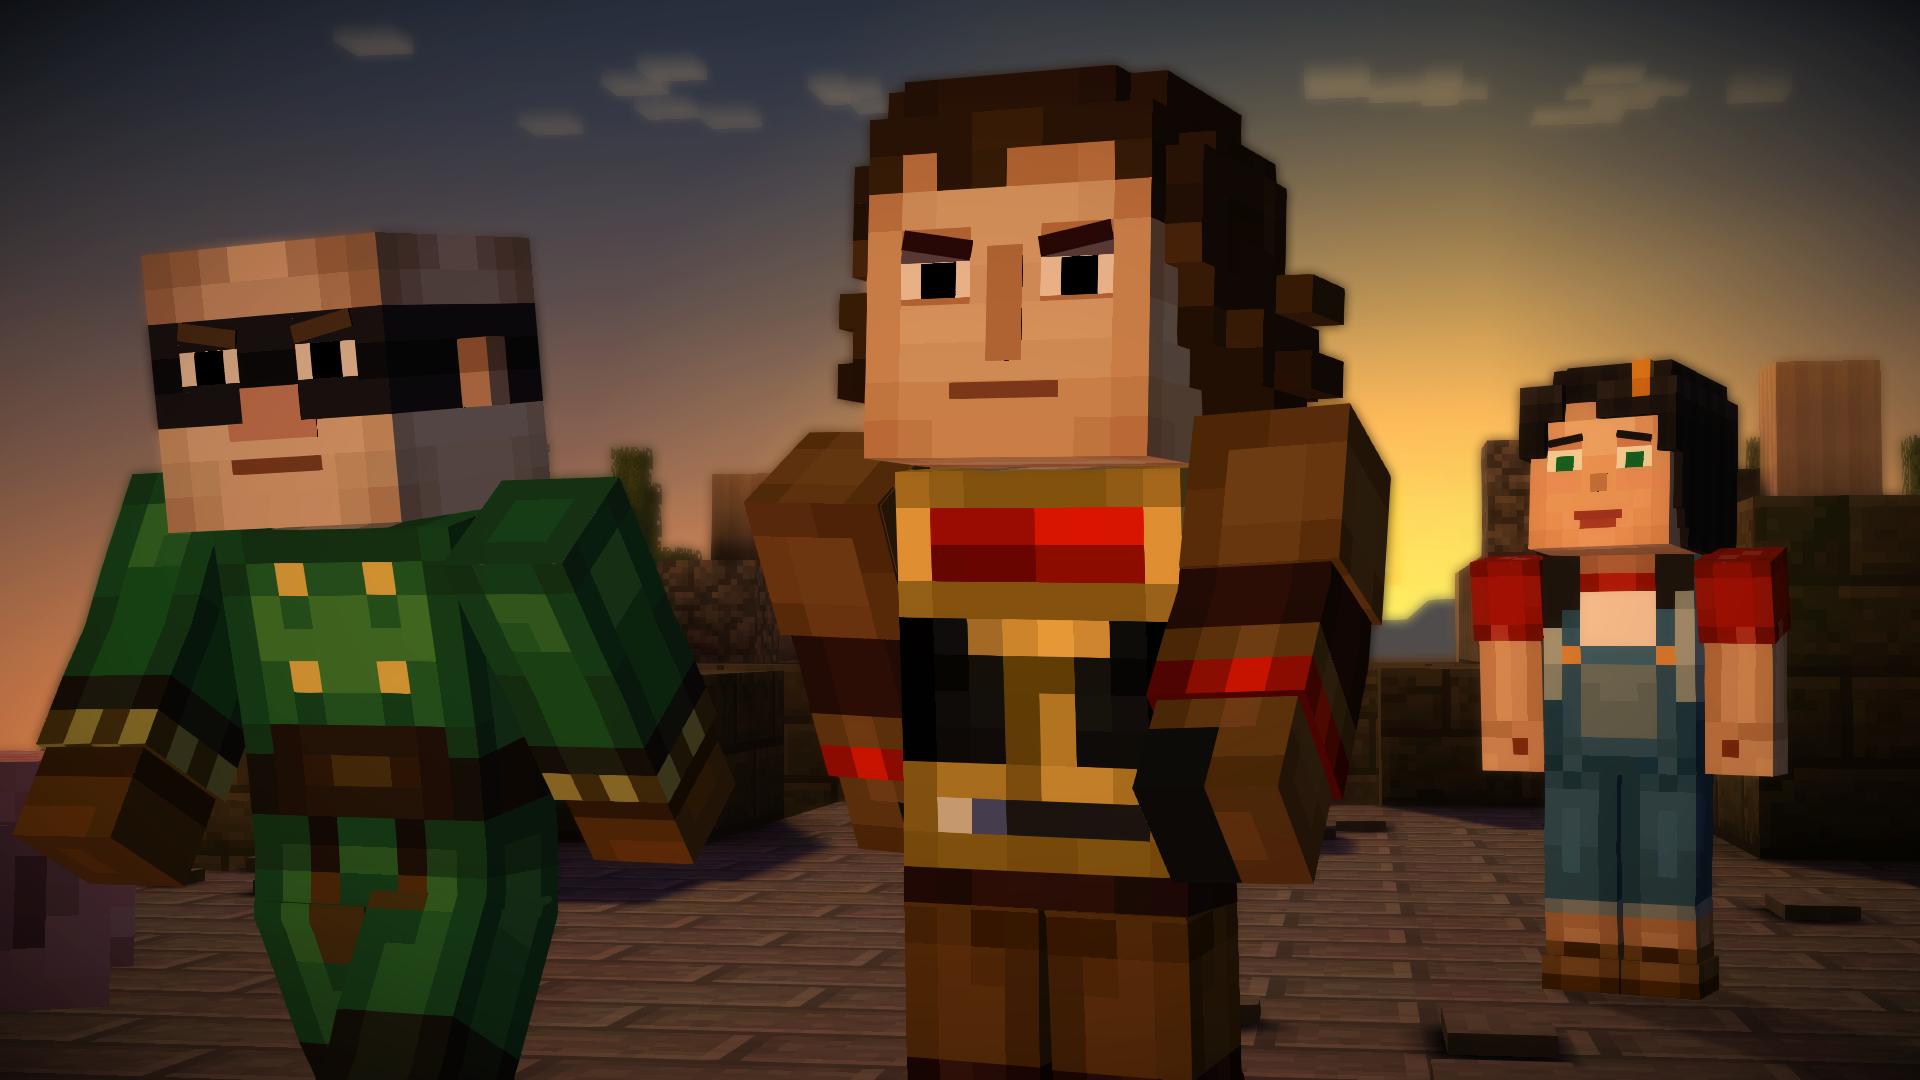 Screenshot Original Png 1920 1080 Minecraft Minecraft Gameplay Story